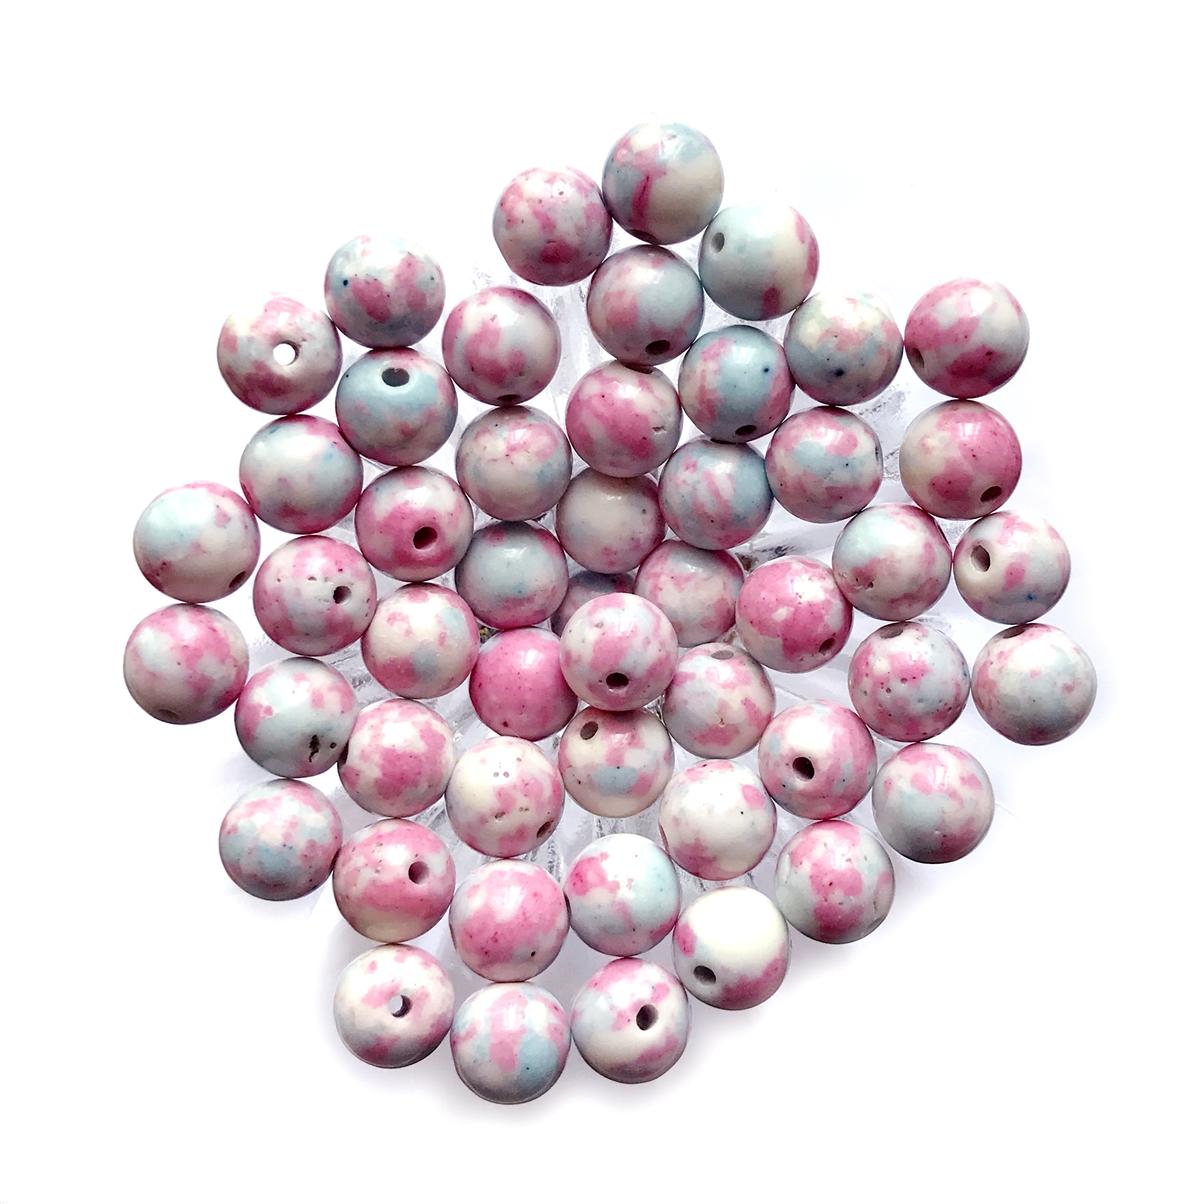 Semi Precious Stone Beads Synthetic Impression Mixed Stones Pink